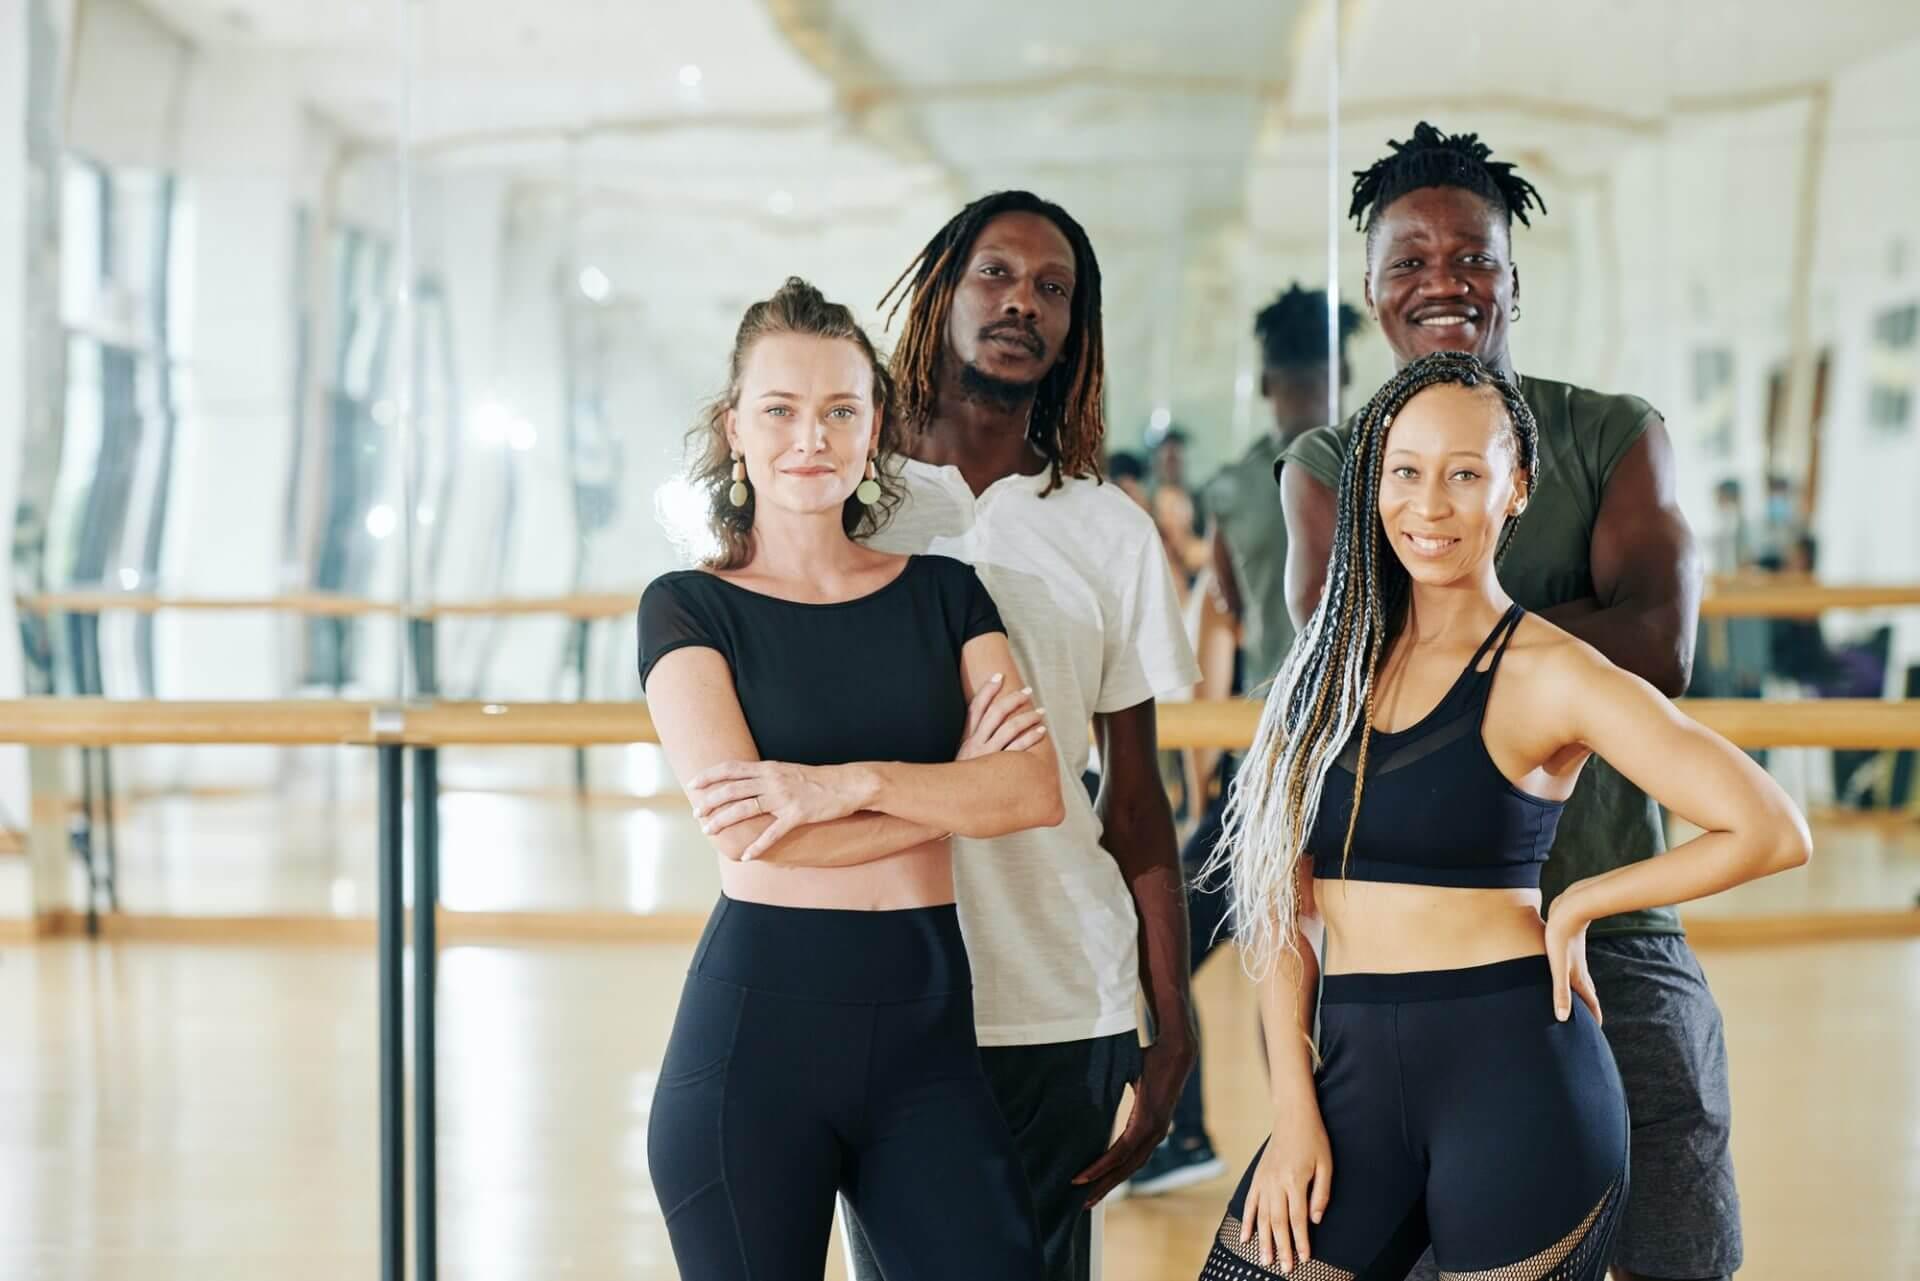 Multi-ethnic group of dancers